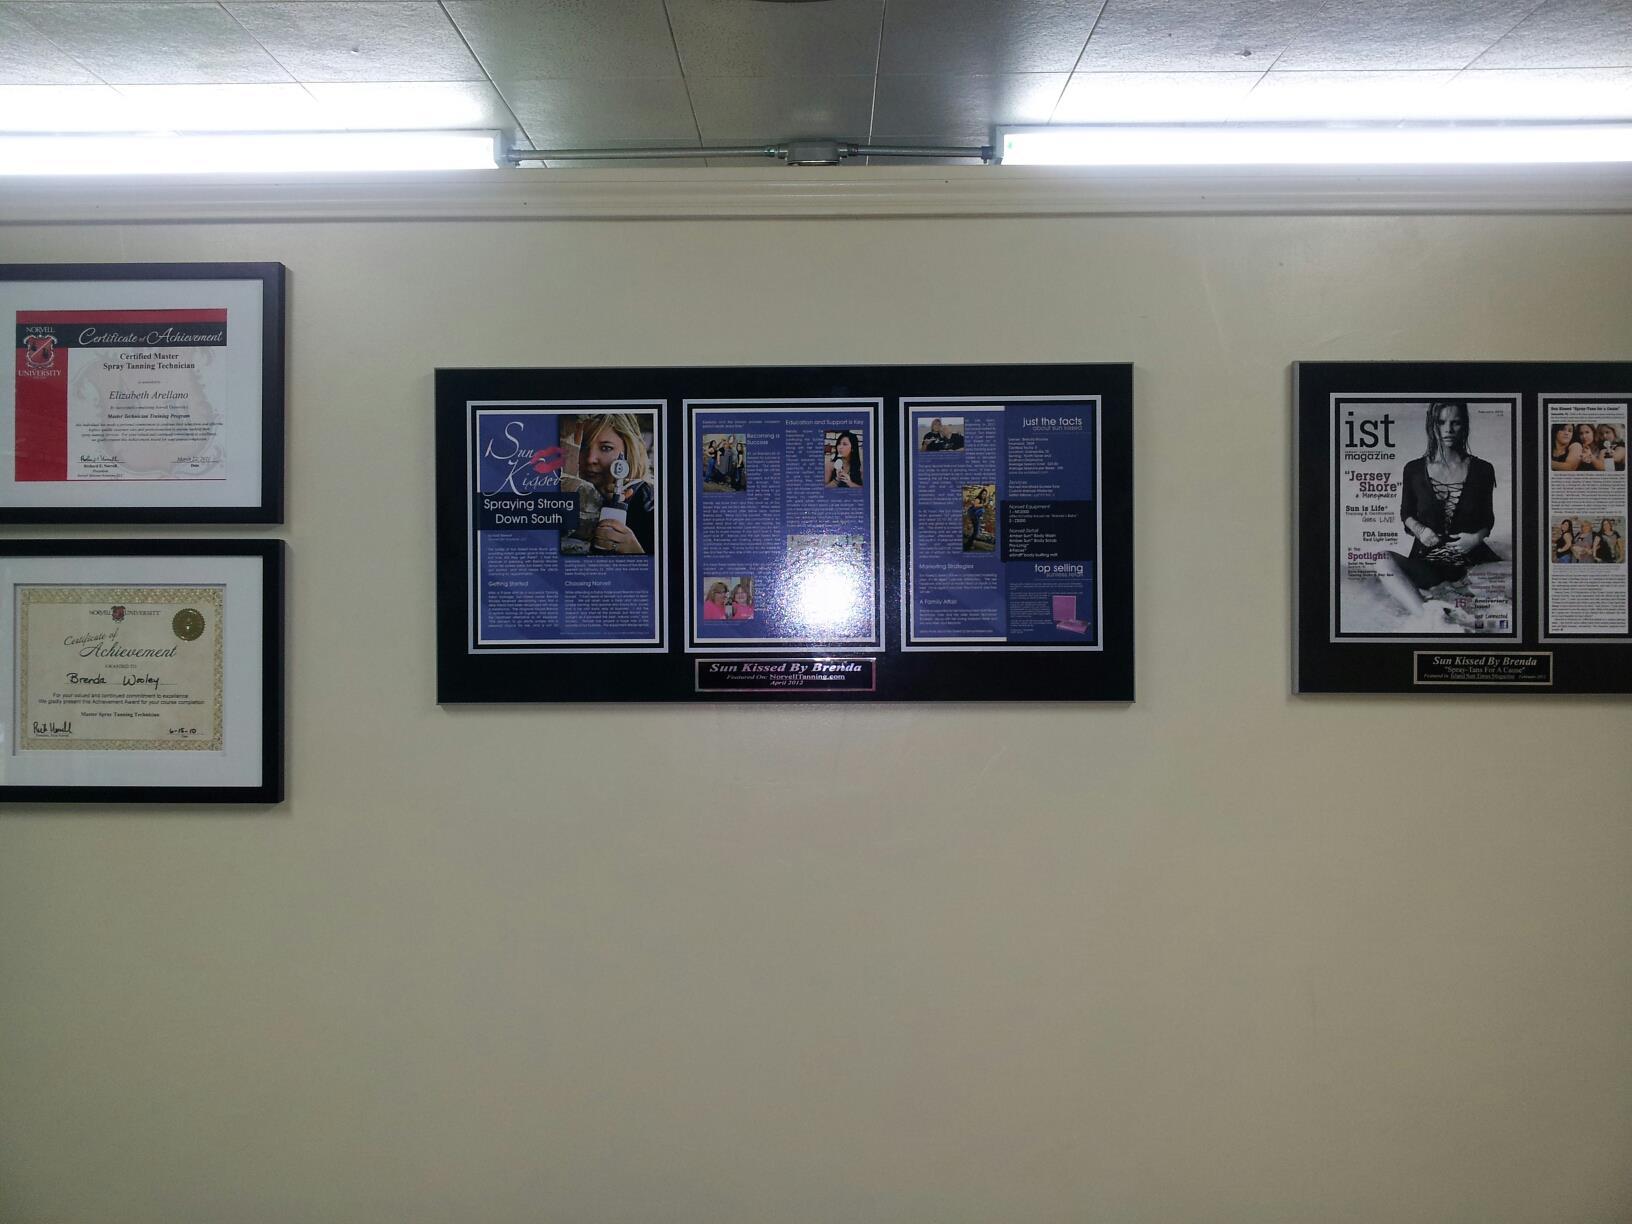 framing magazine articles, magazine articles framed, magazine plaques